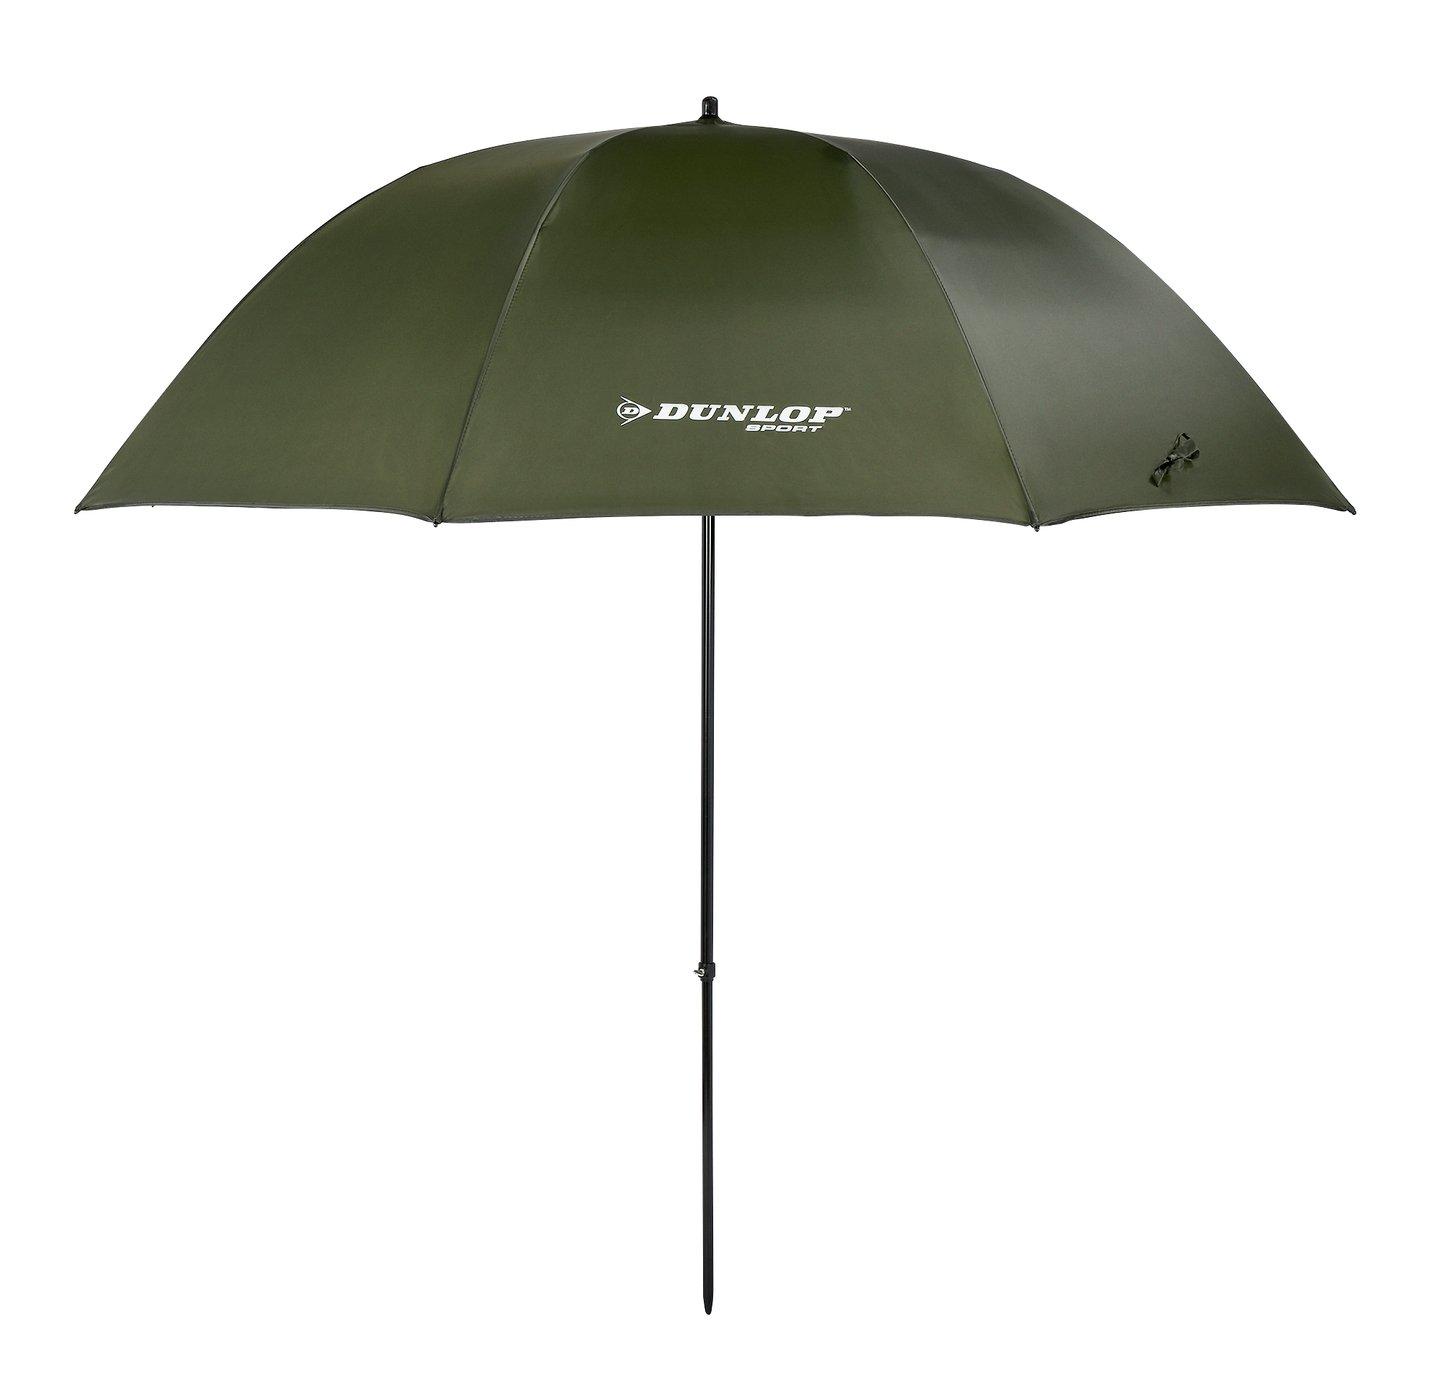 fishing chair argos desk reviews accessories dunlop 2 5 large umbrella